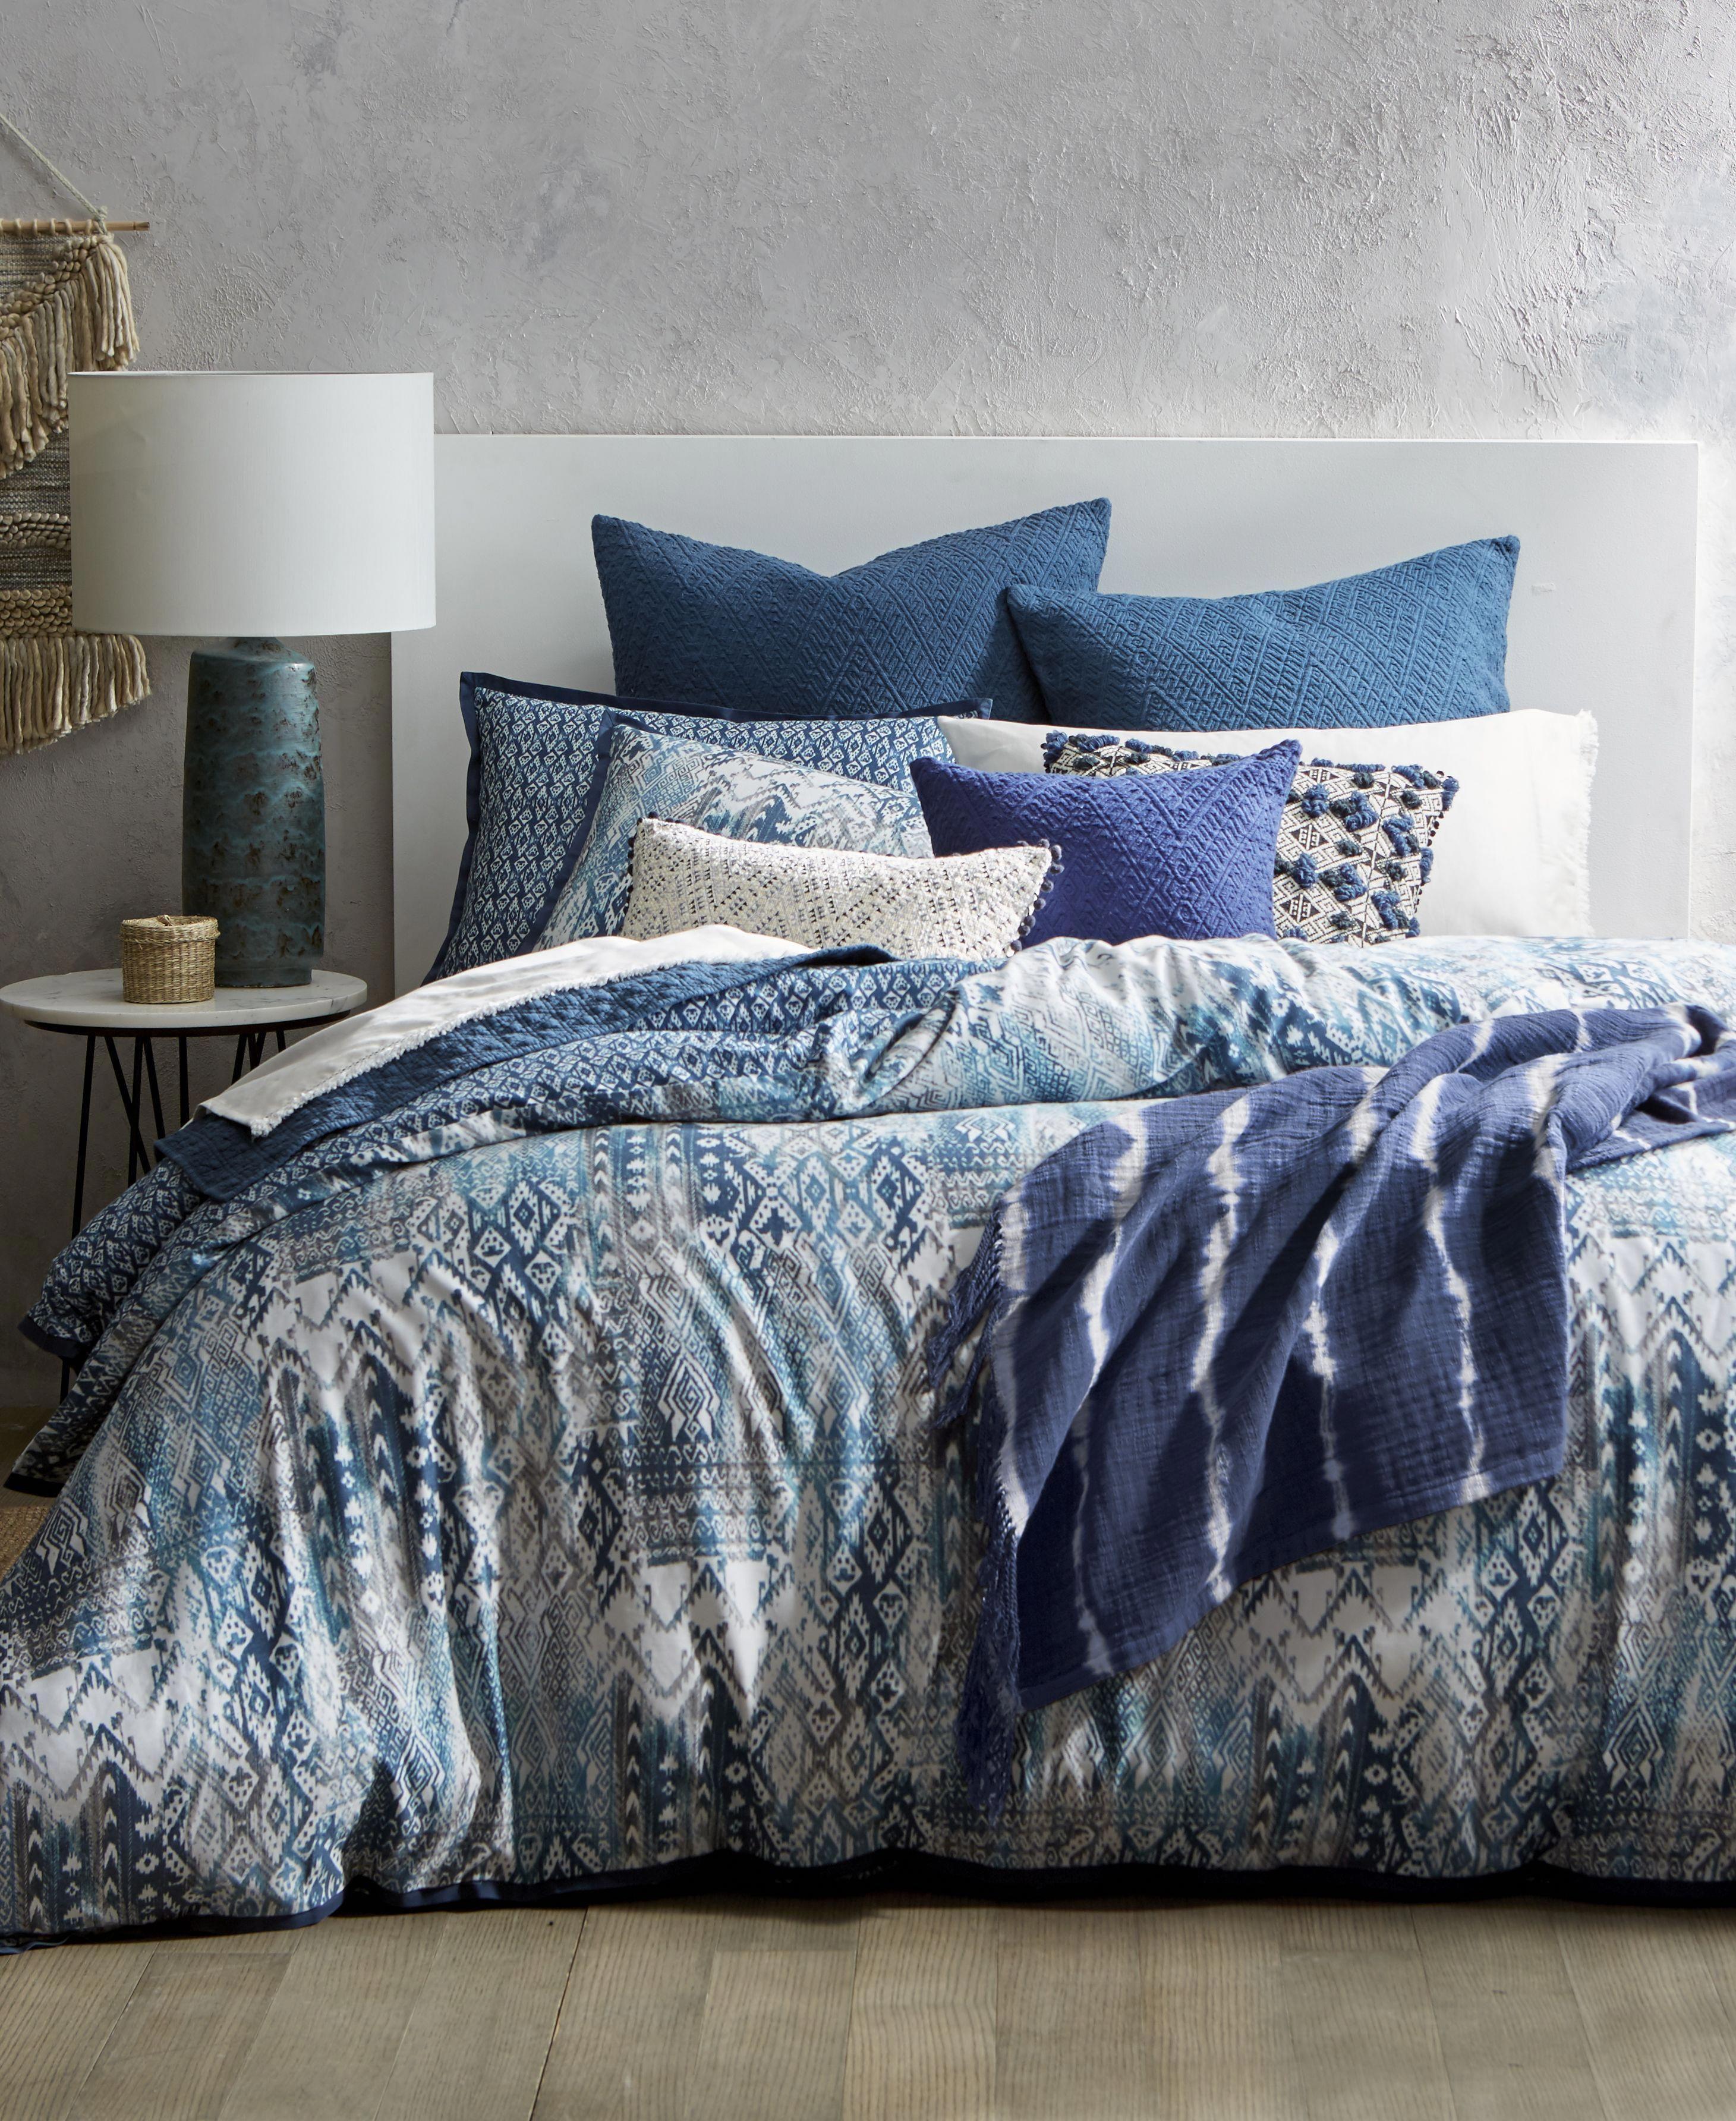 California King Luxury Bedding Luxurybeddingsetsqueen Bed Linen